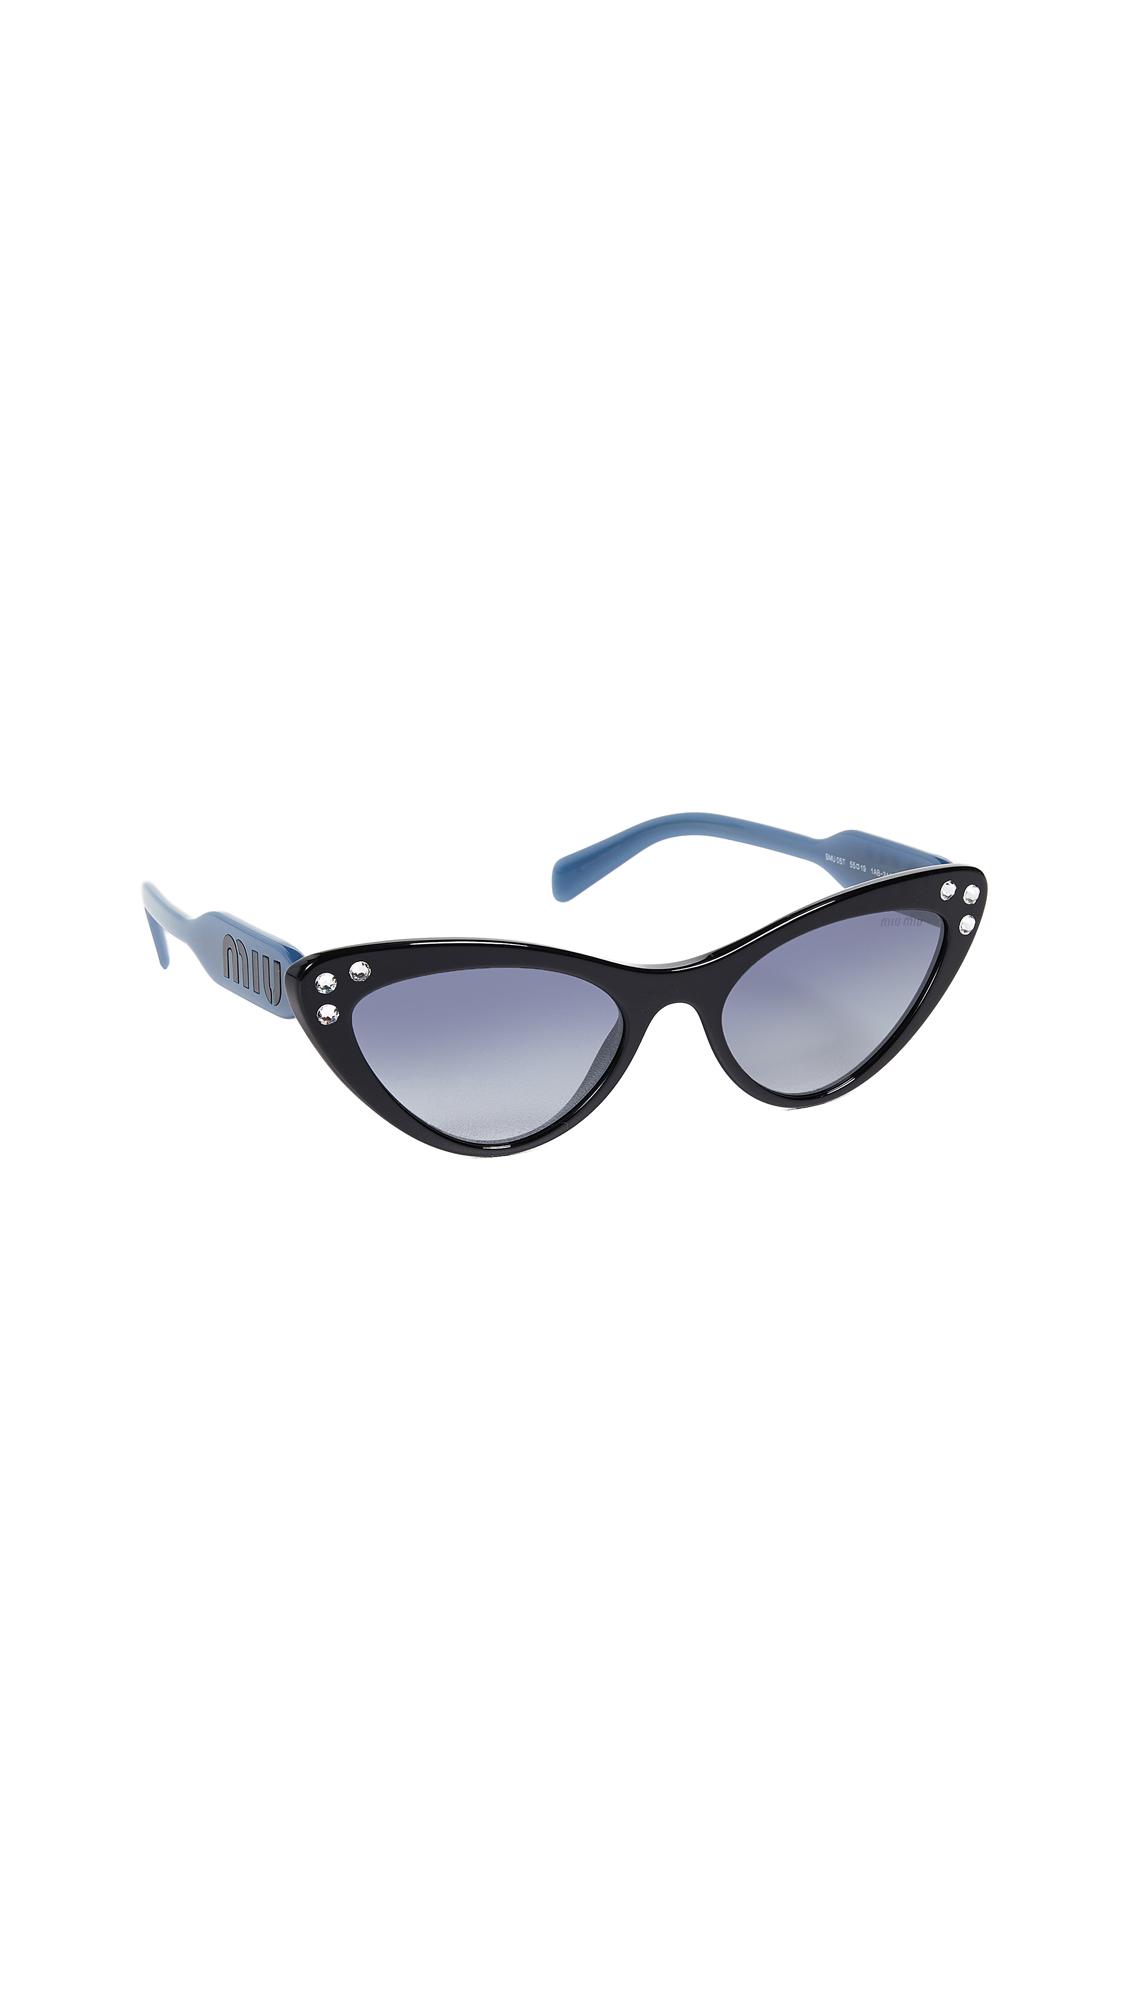 Crystals Cat Eye Sunglasses in Black/Blue Mirror